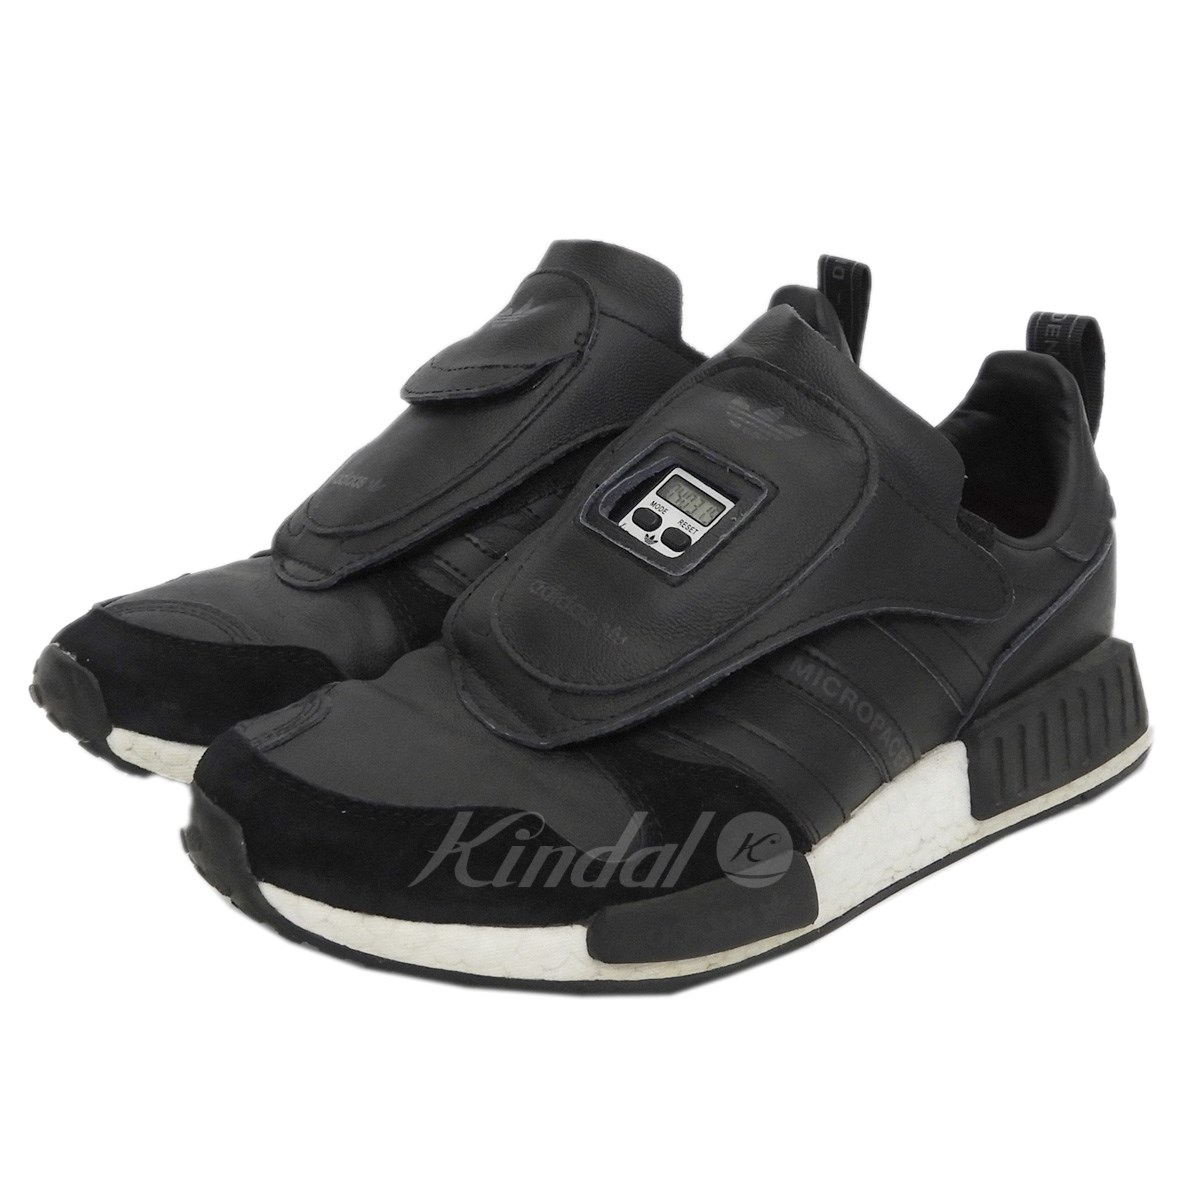 Champion x Adidas NMD Boost XR [2017.9.18] $129.00